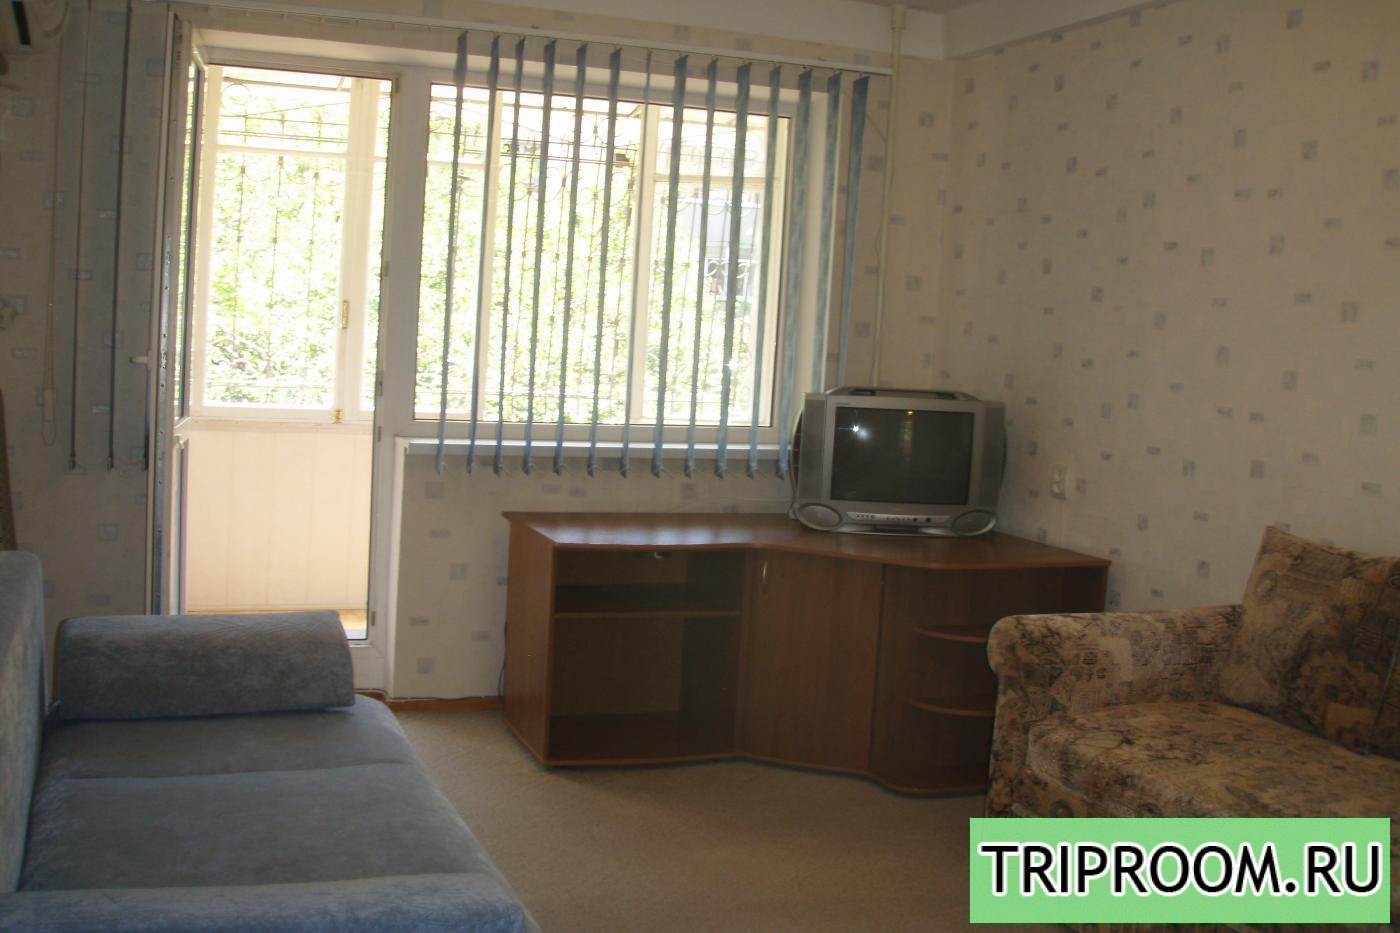 1-комнатная квартира посуточно (вариант № 644), ул. Меньшикова улица, фото № 2